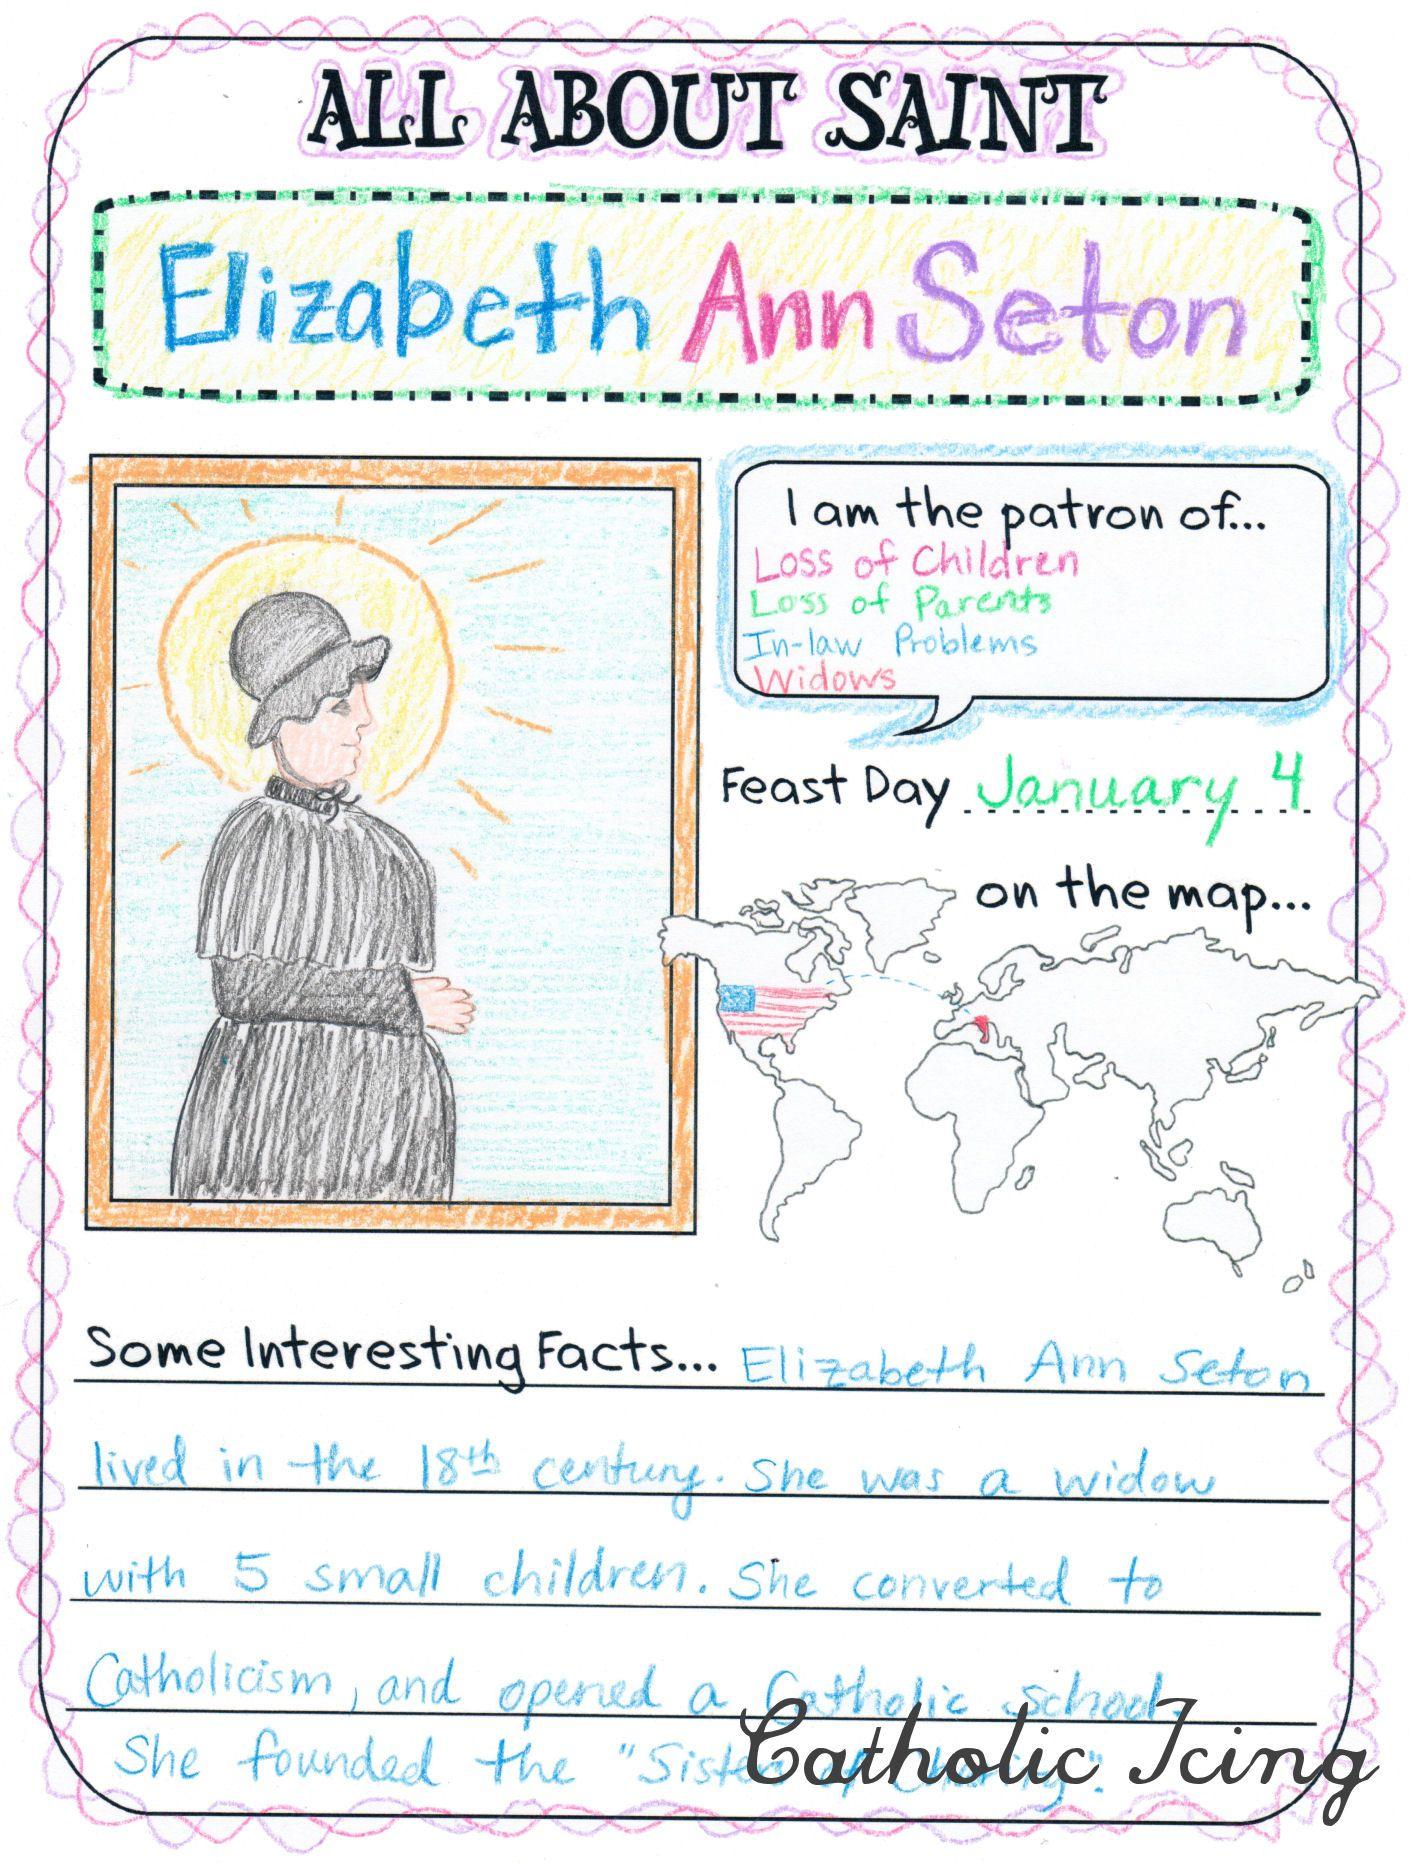 printable saint report page for catholic kids saints and angels